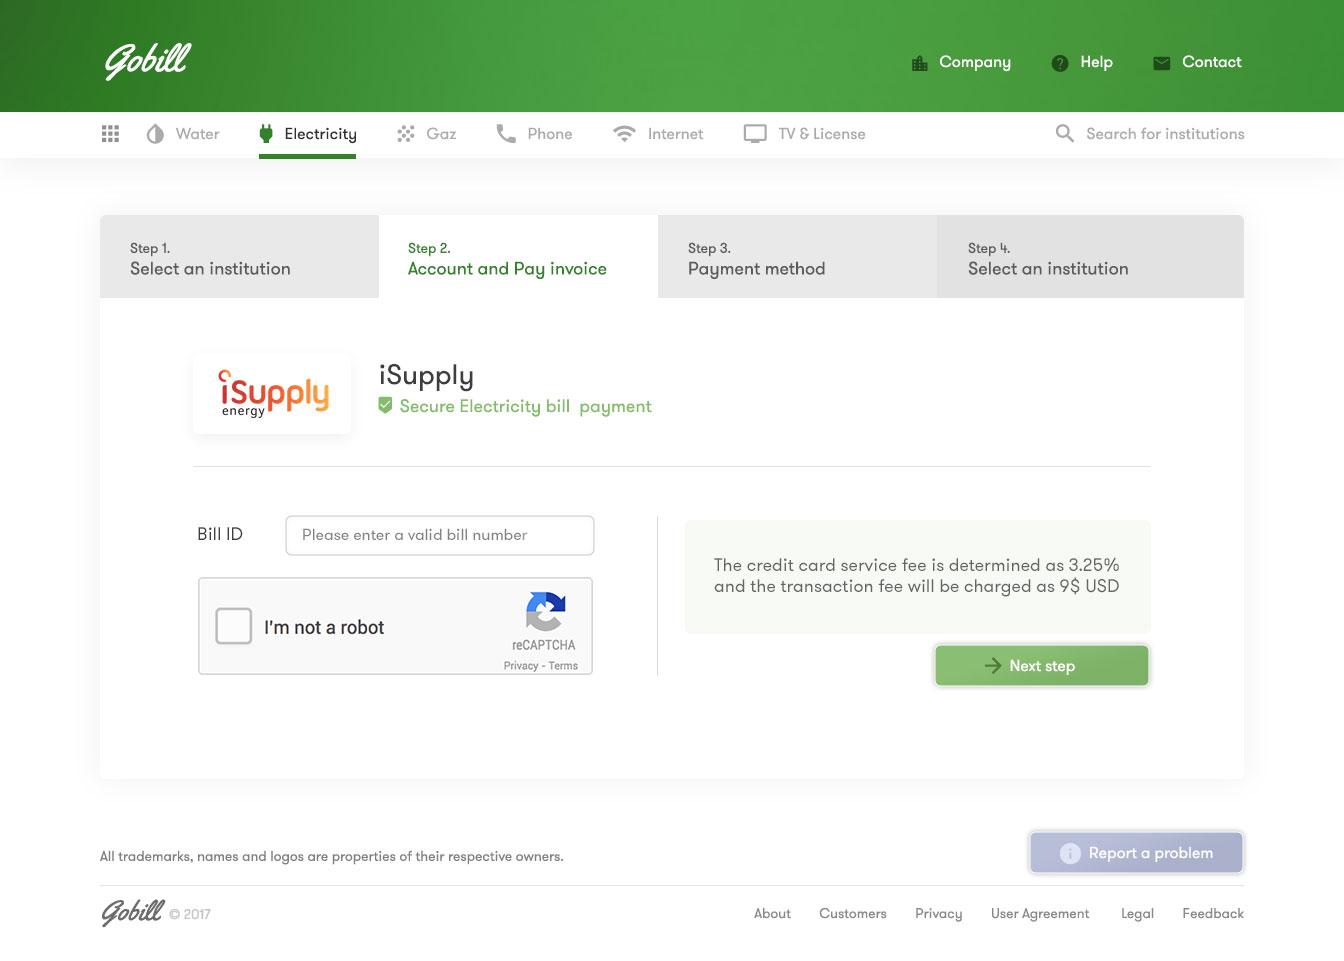 bold serious invoice web design for kacirmasak in turkey design 13758338